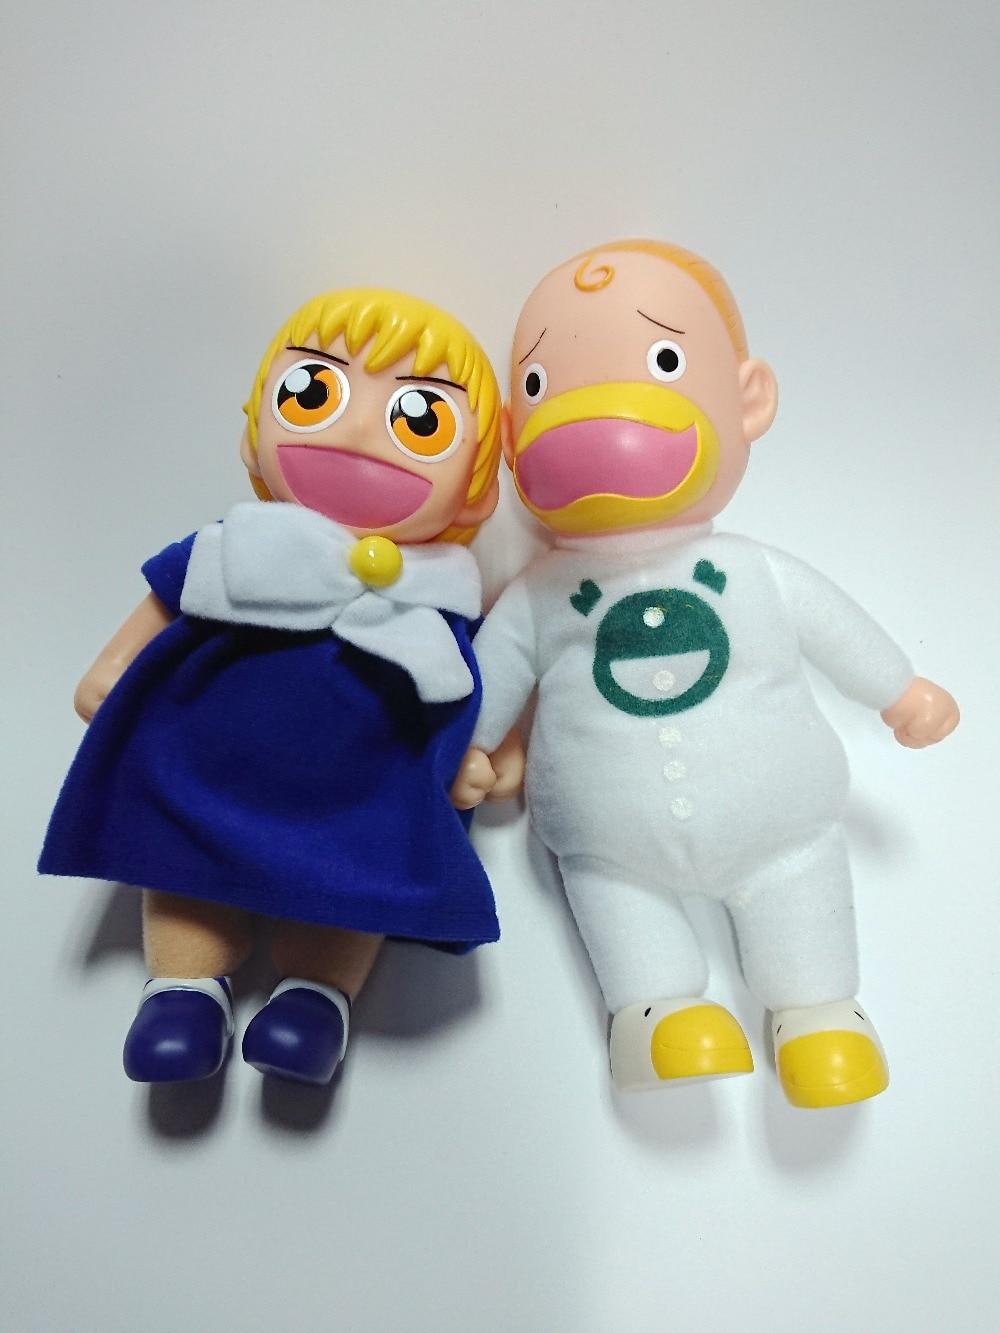 2pcs/set Gash Bell Gasshu Beru Zatch Bell Vinyl Doll Action Figure Doll Toy Model